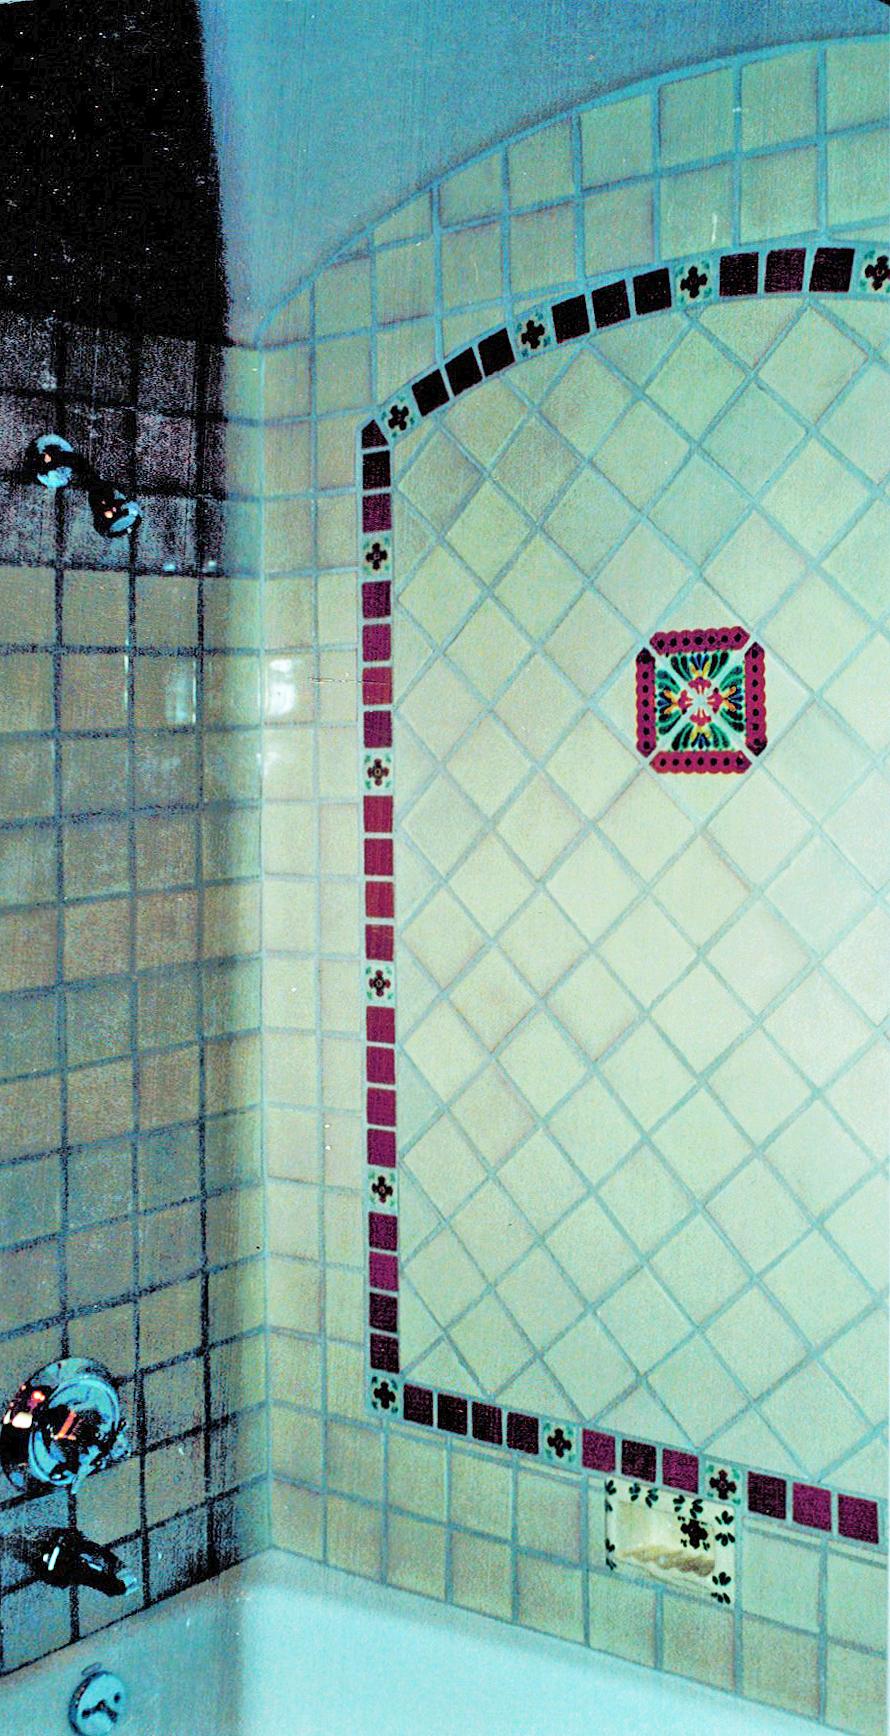 Bath 10 4 x 4 Blanco, Cadena 2 x 2 Terra